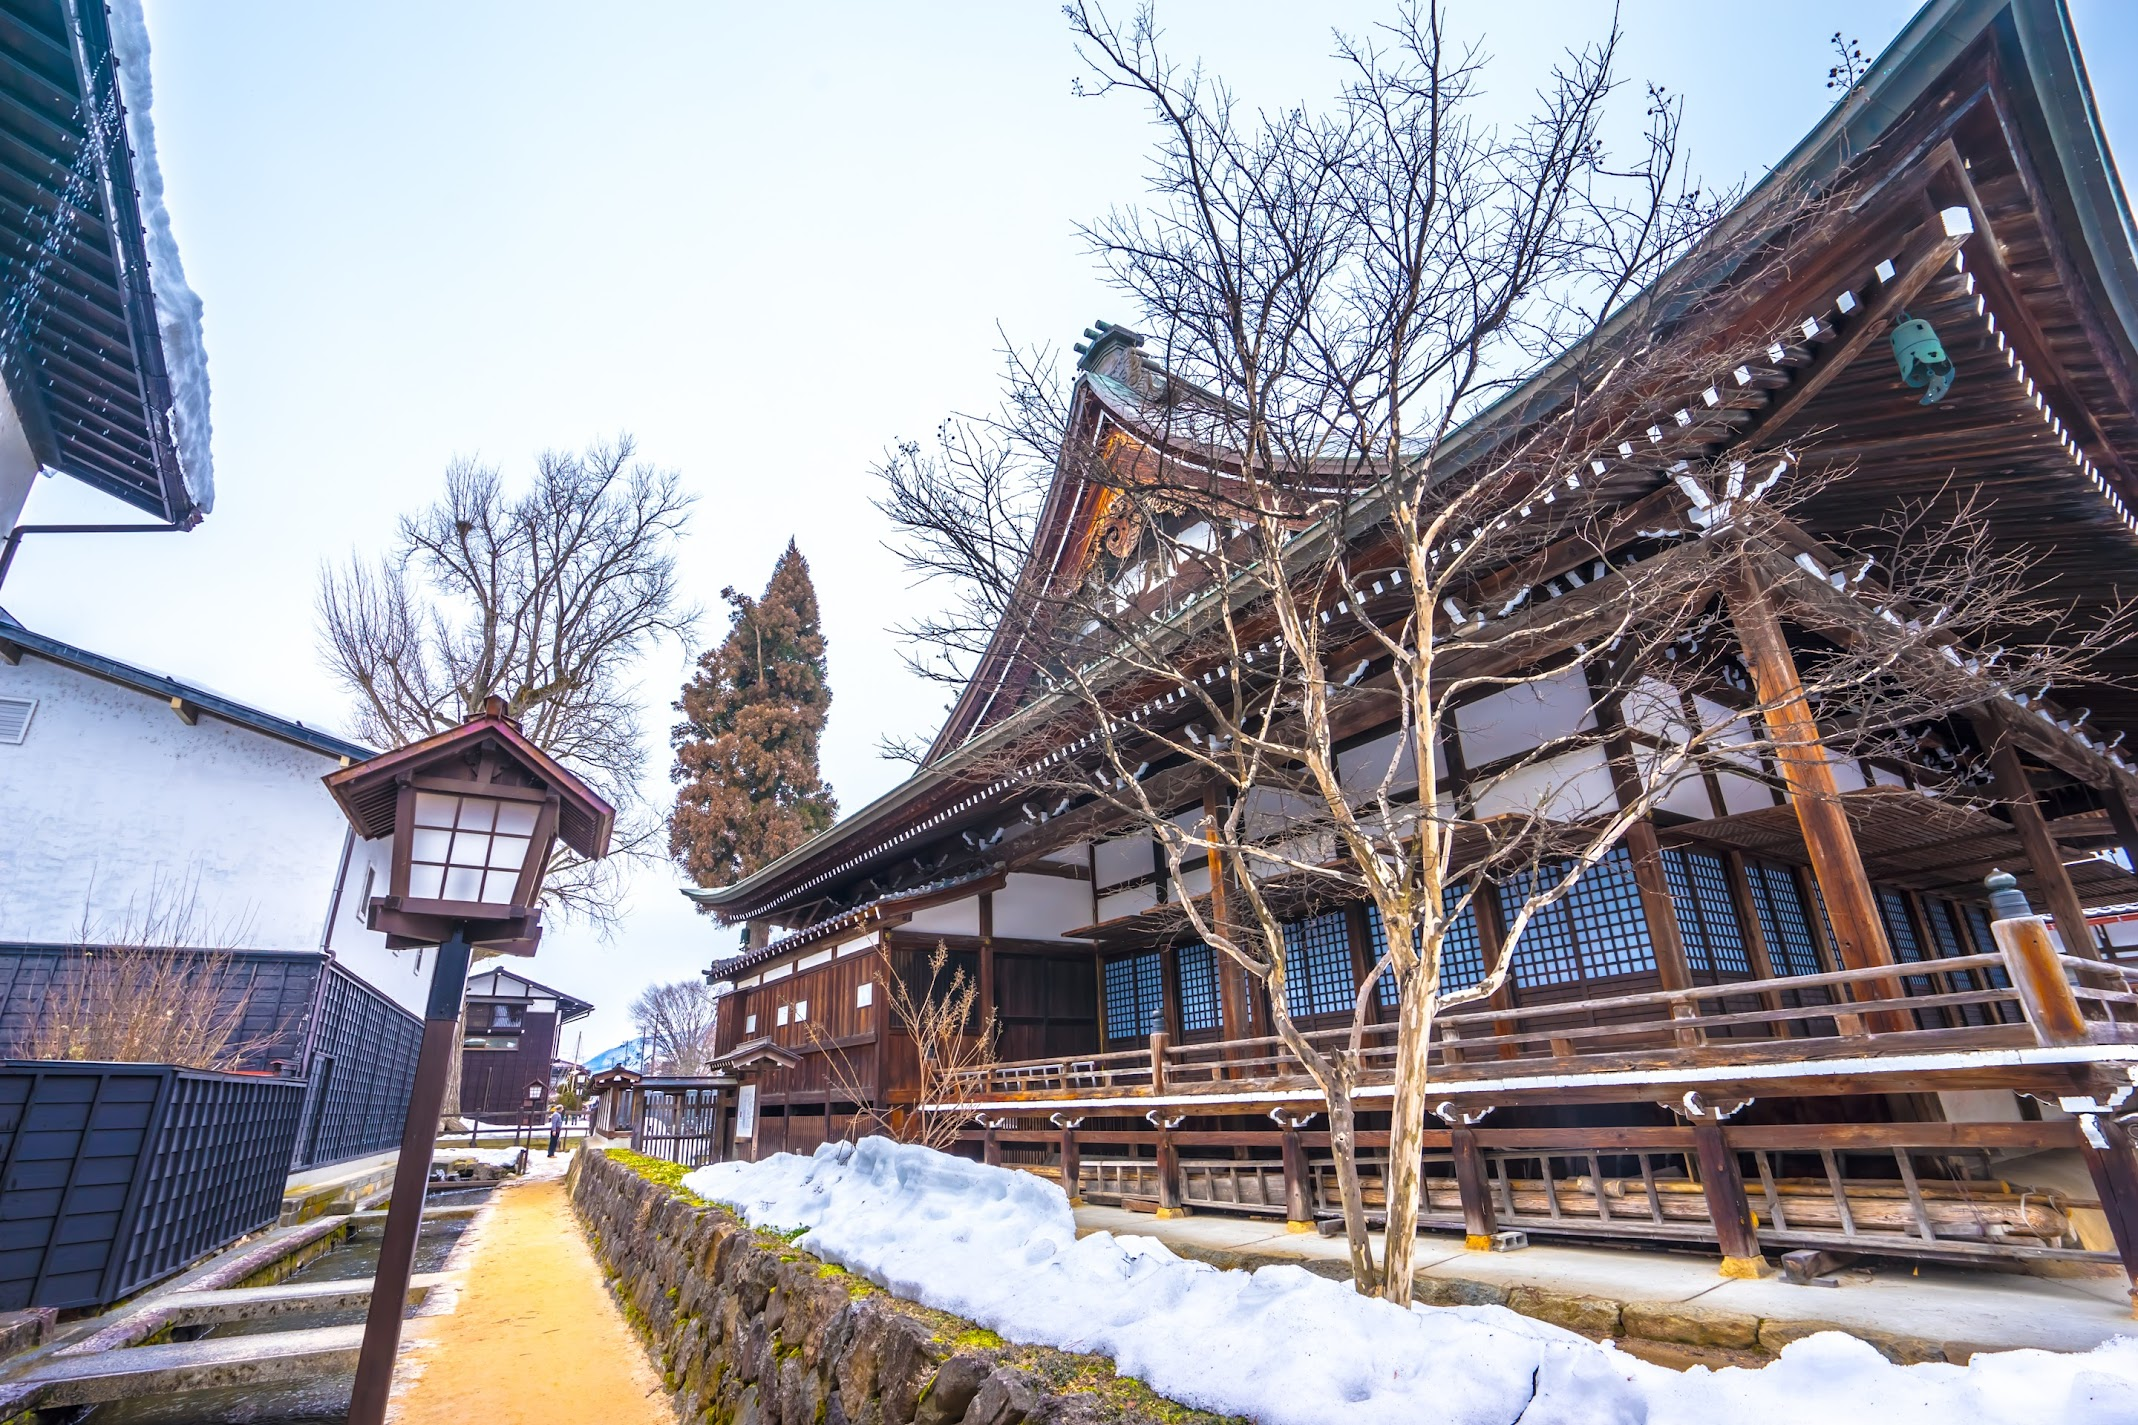 Hida Furukawa Enkoji Temple White Walled Storehouse Street1